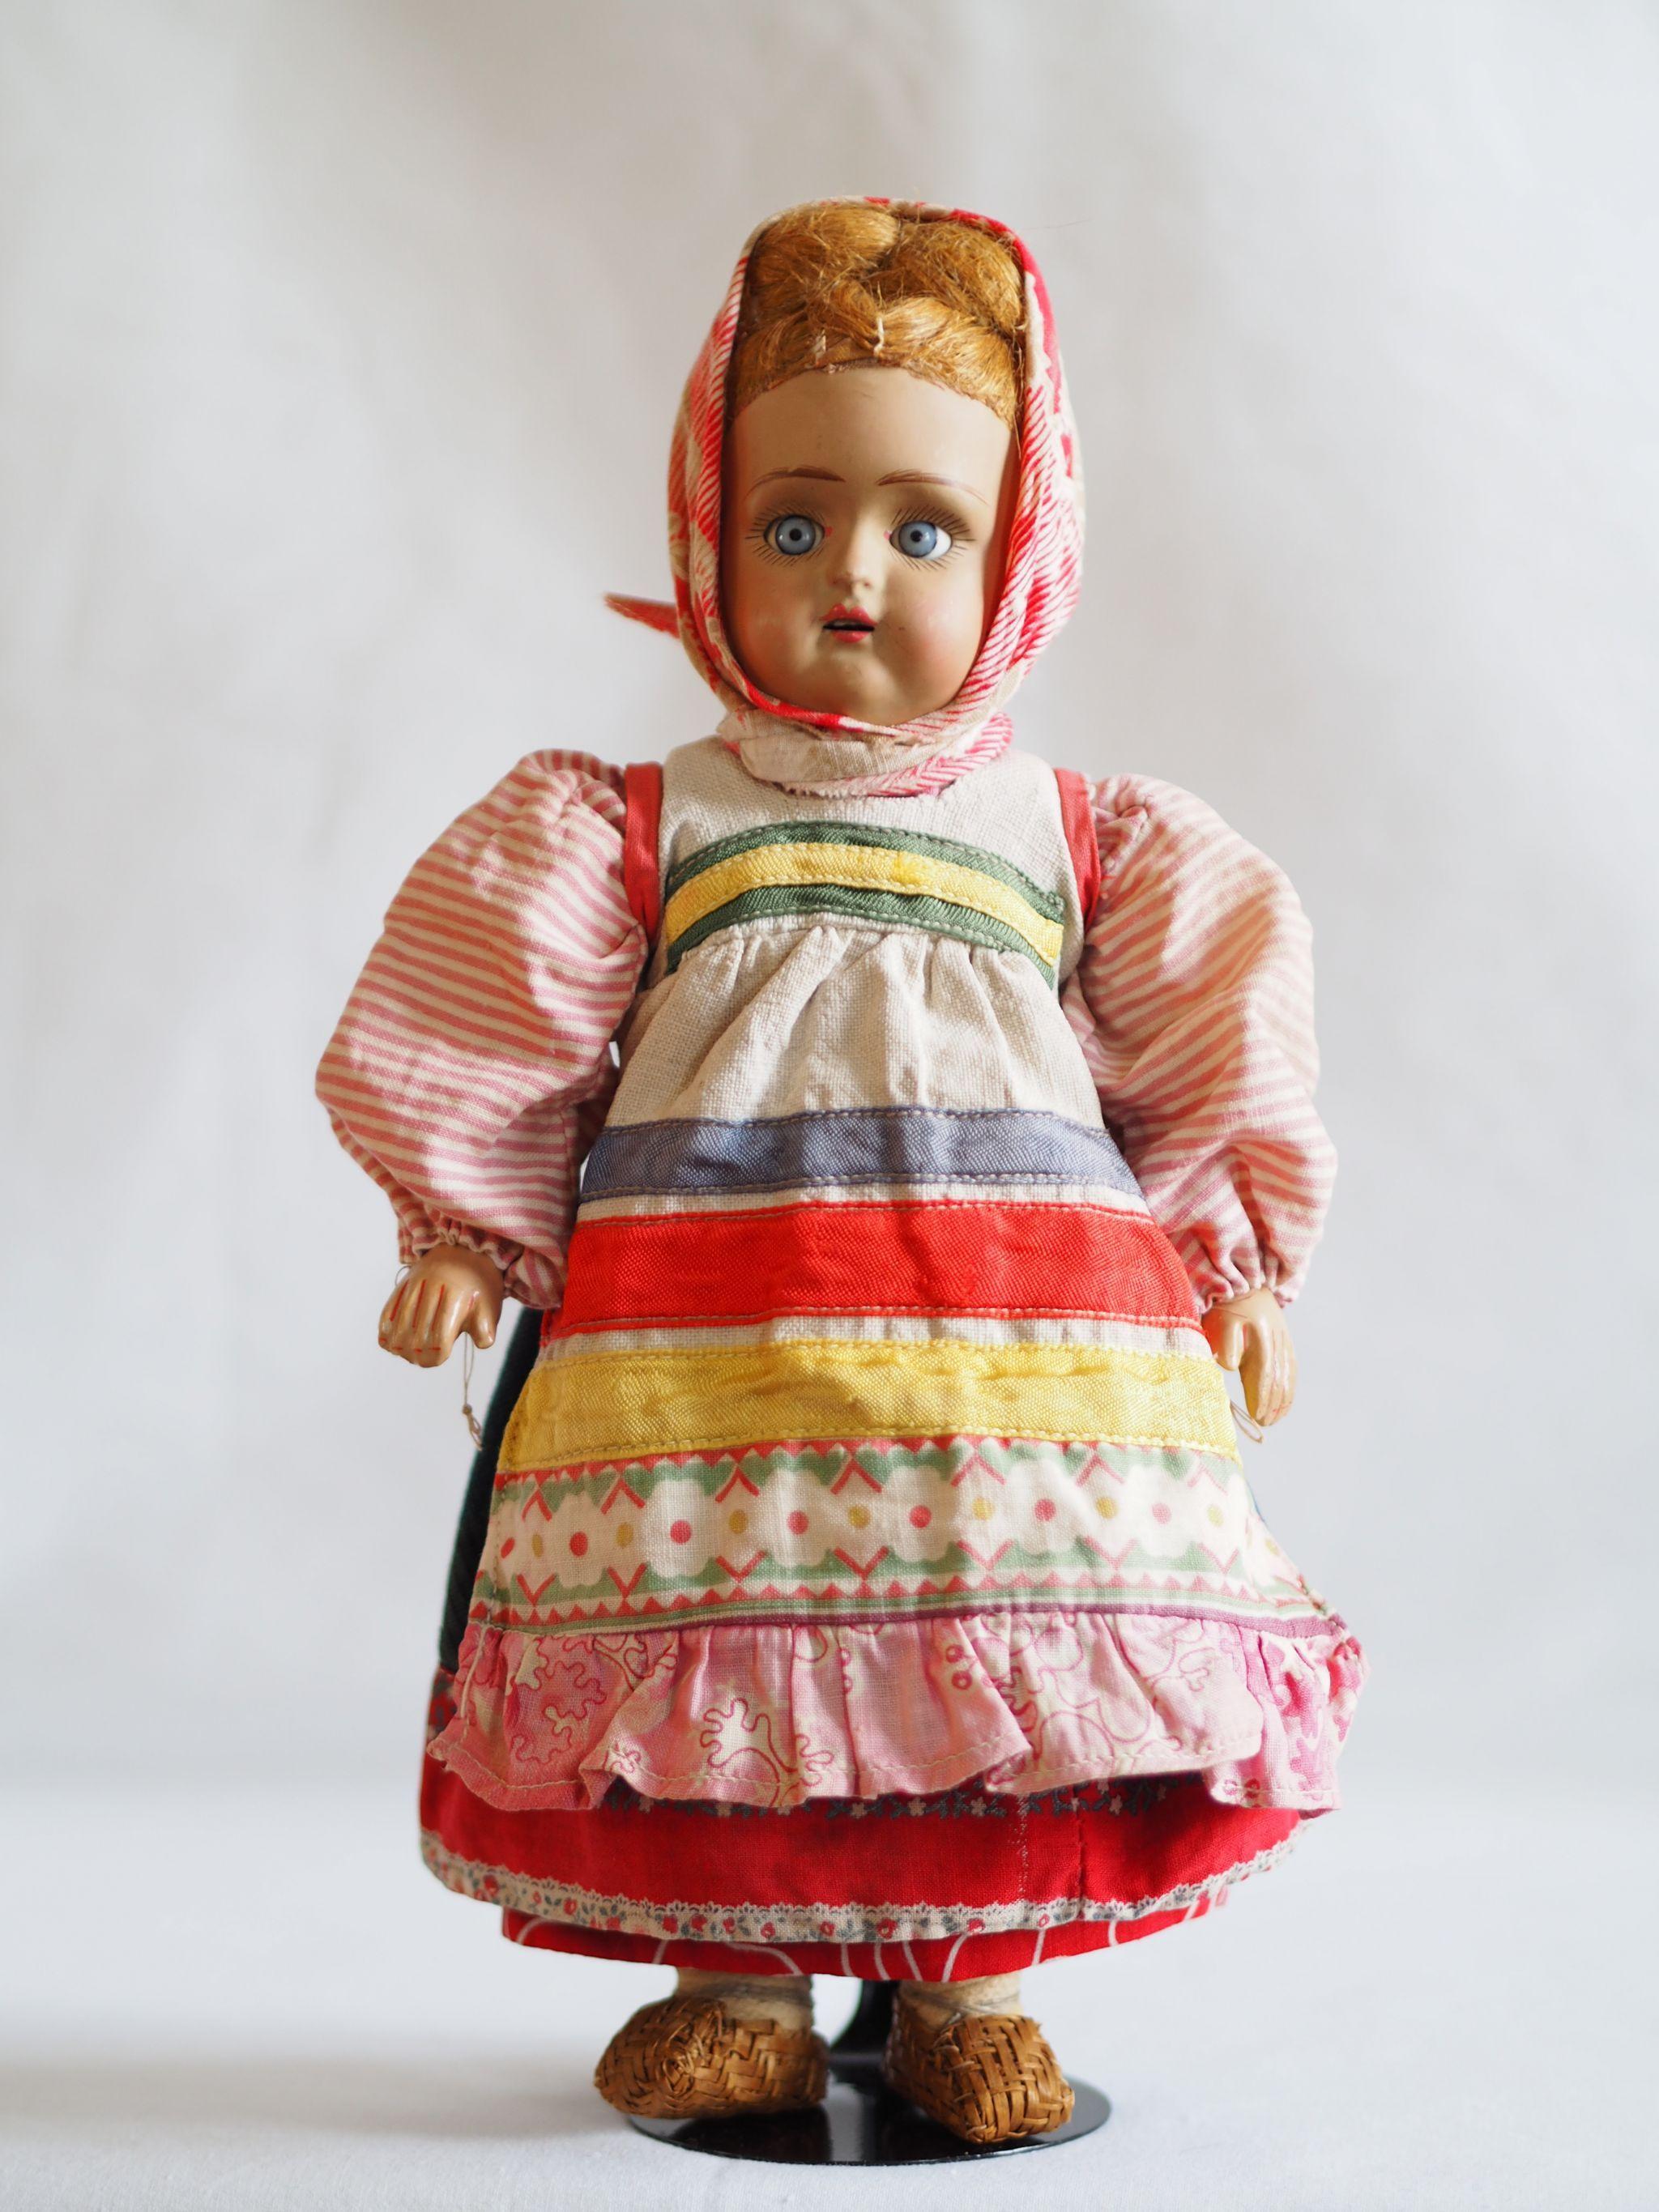 картинки старинная кукла из чурочки апрелемае долине пасутся